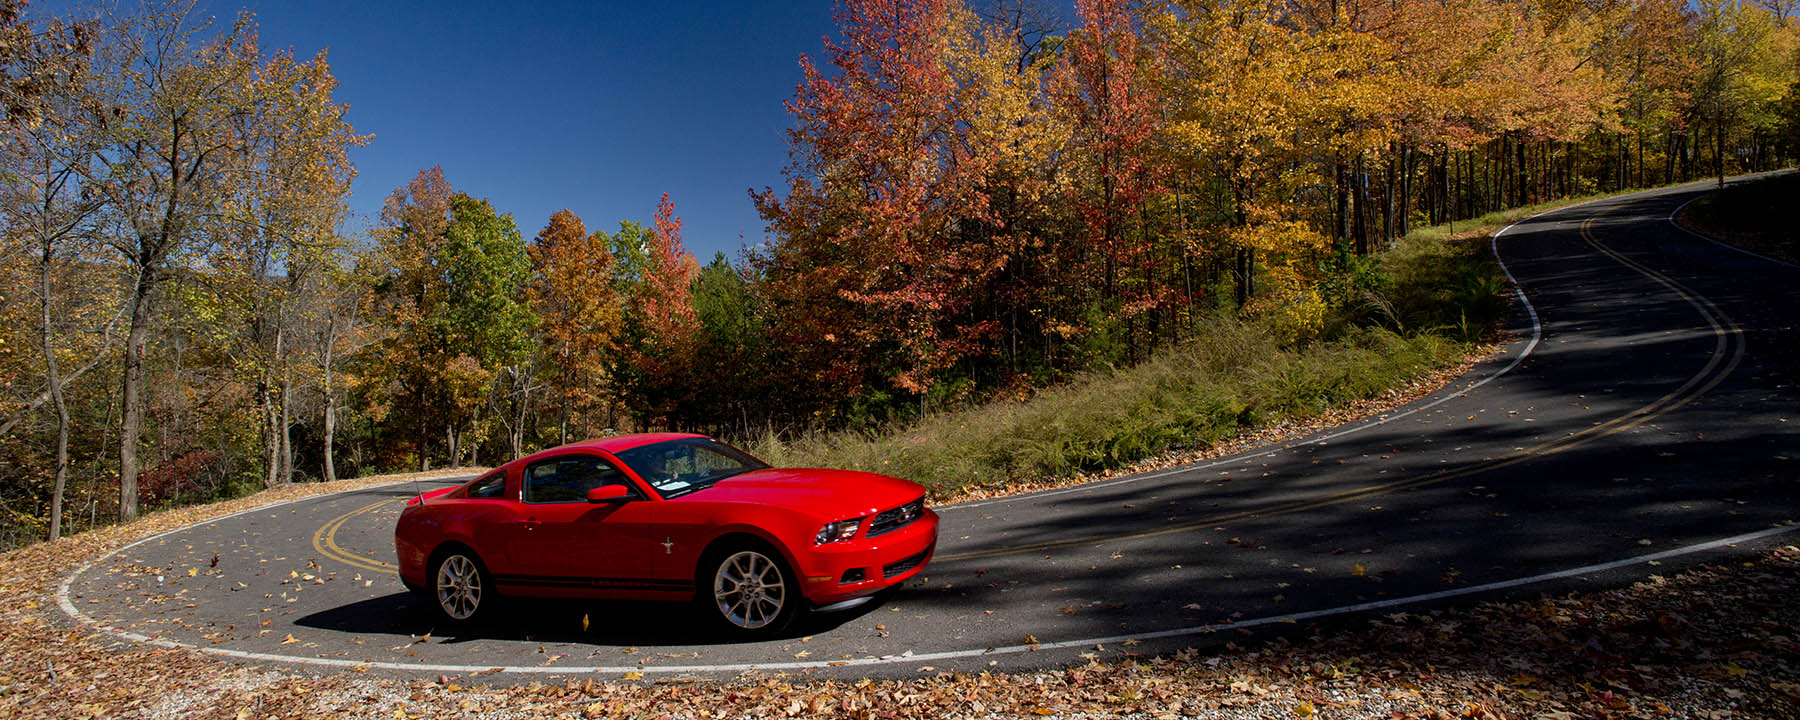 Arkansas-Good-Roads-Foundation-About-Us-Image